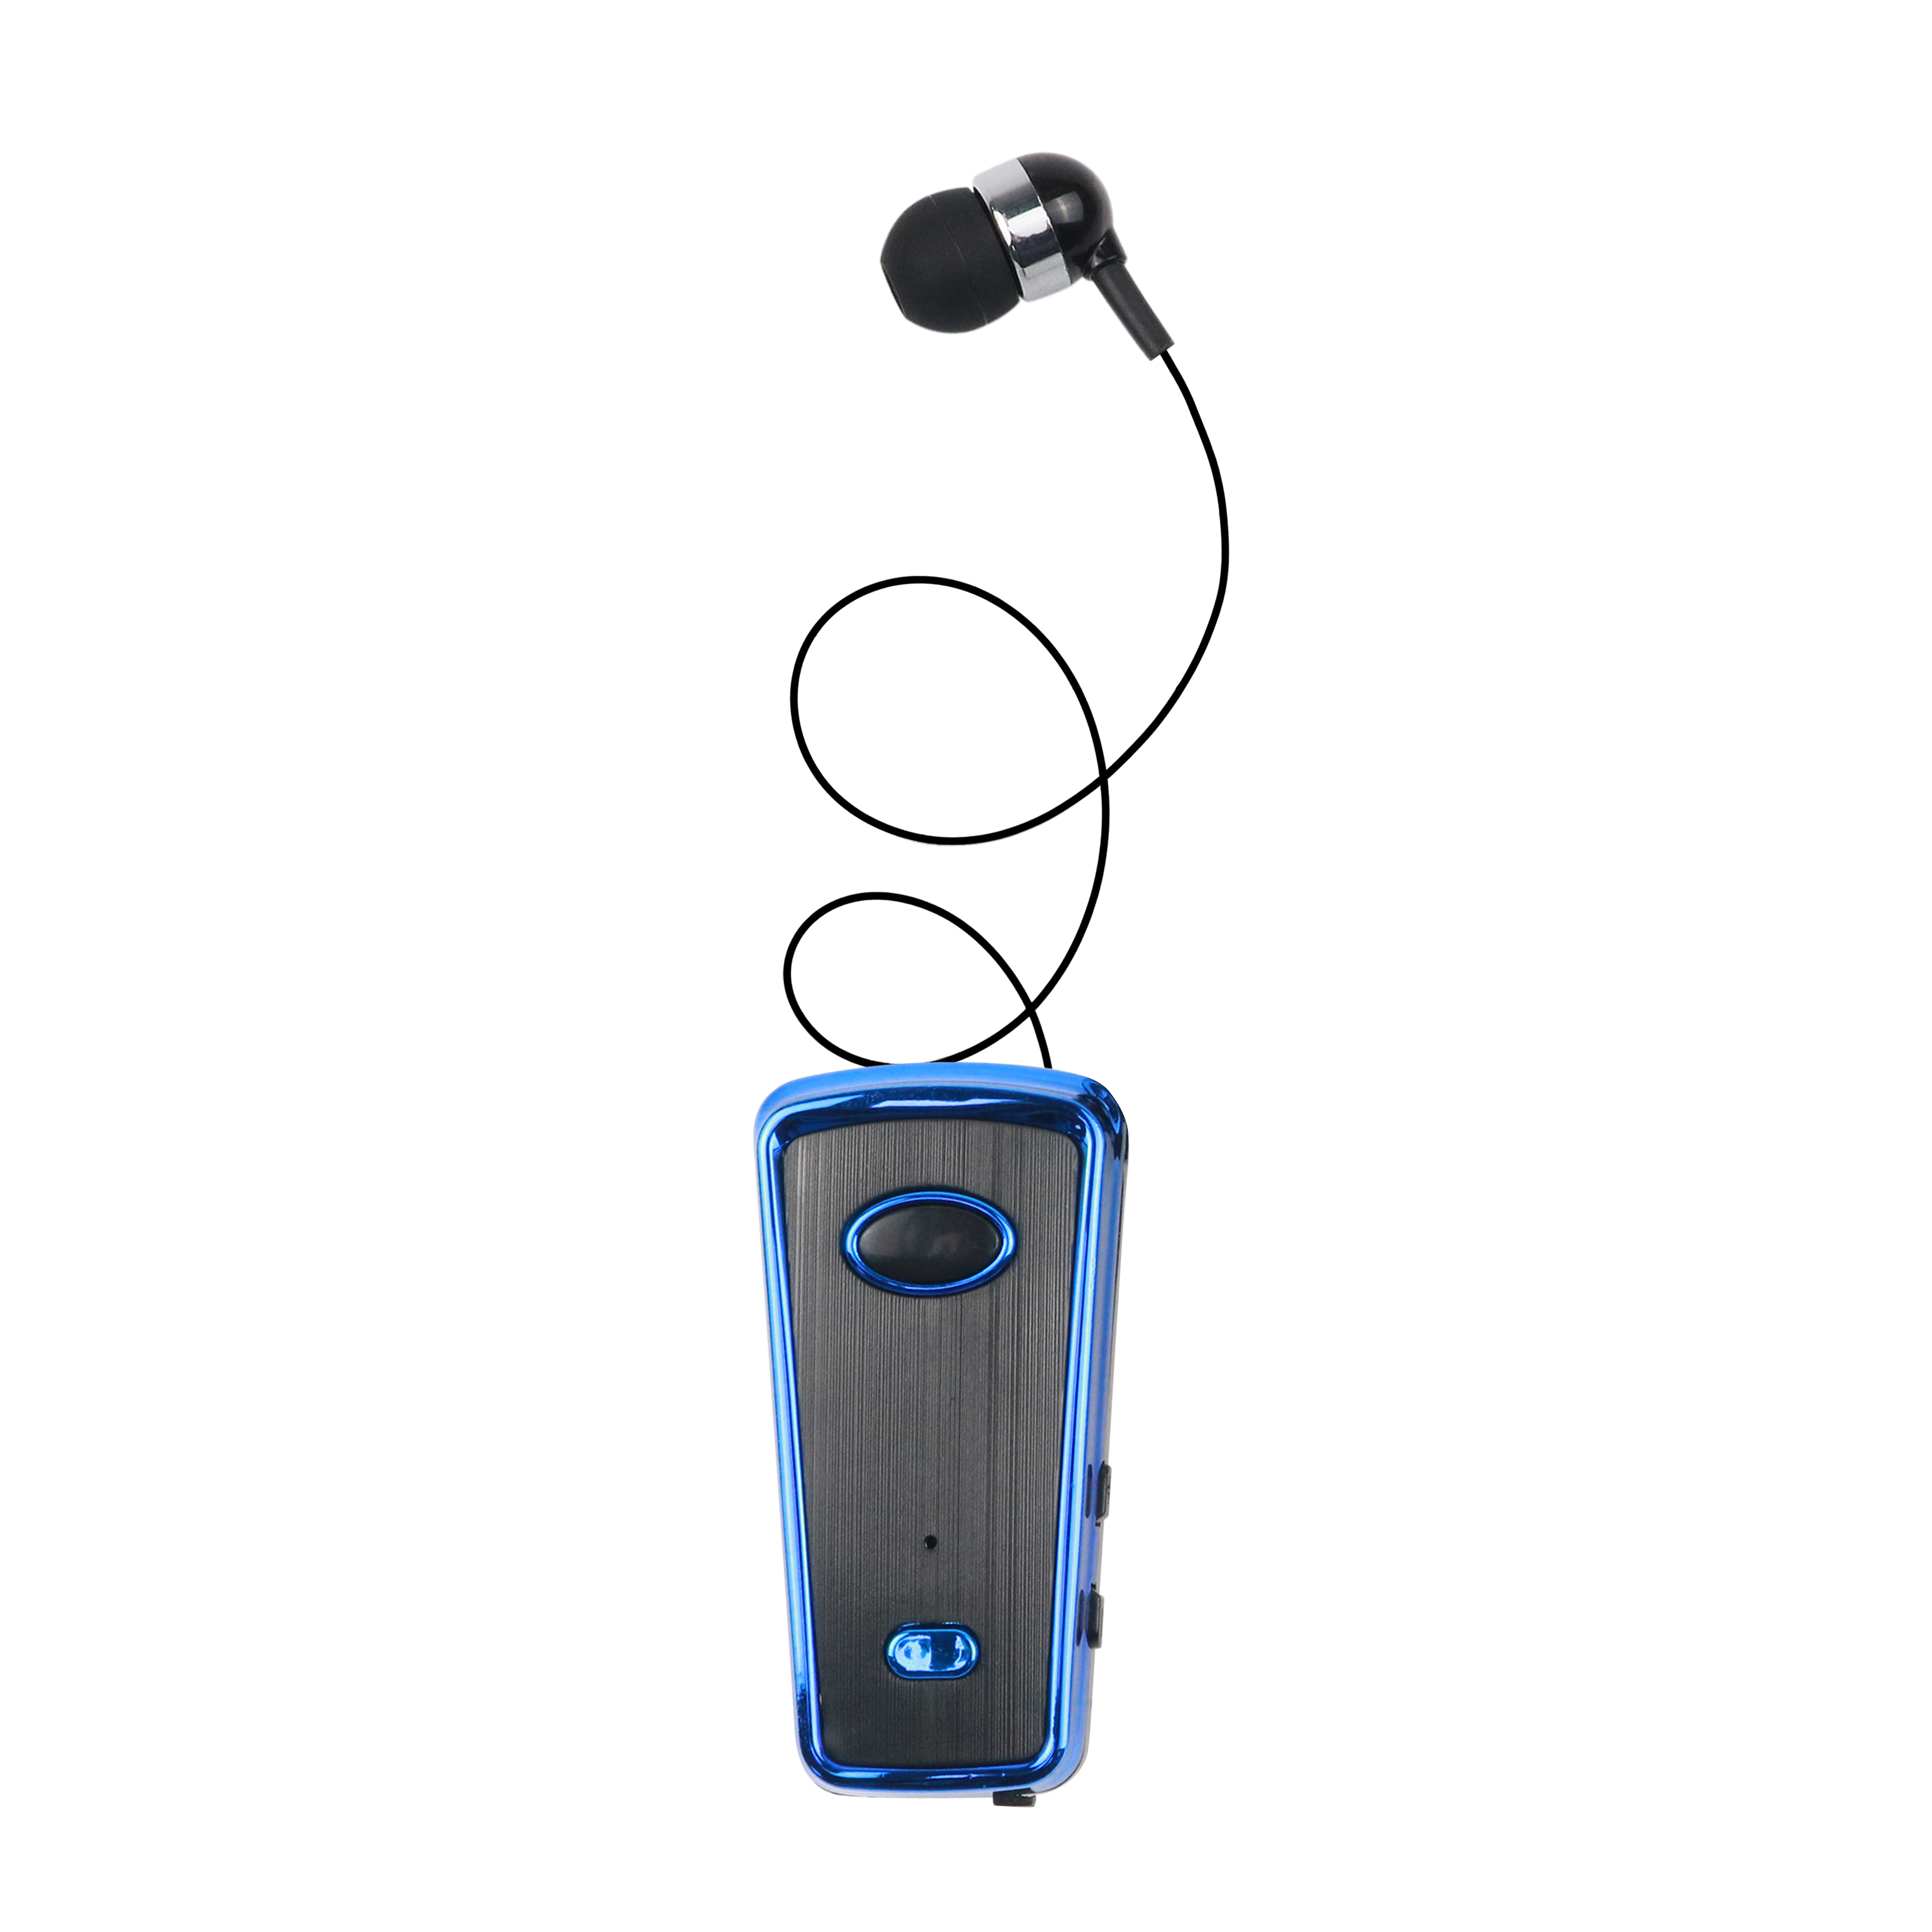 Wireless Blue tooth earphones neck clip on business Sport headphones - idealBuds Earphone | idealBuds.net